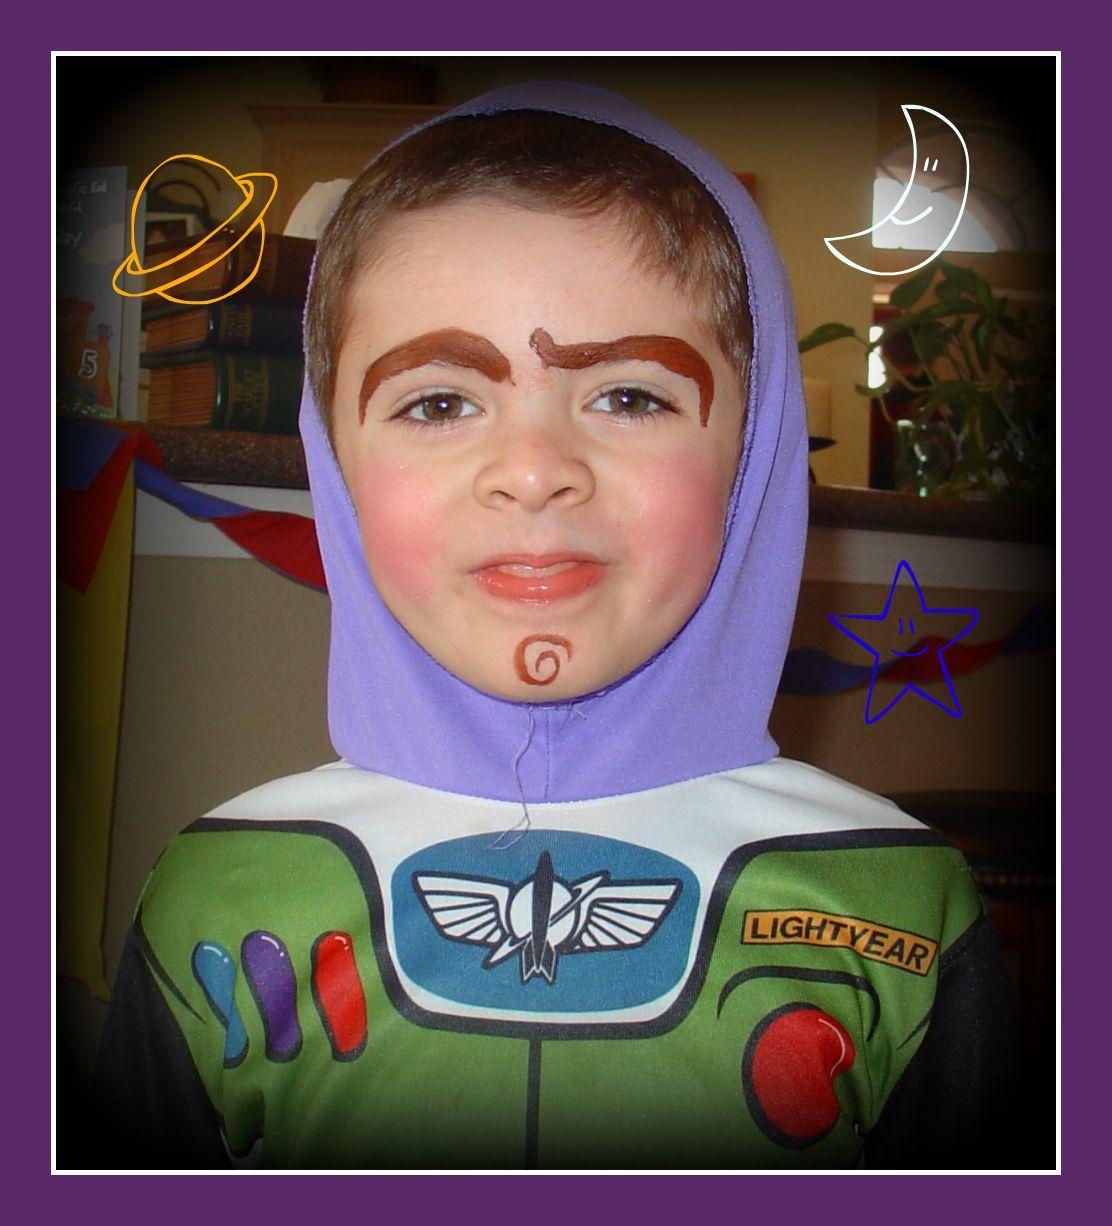 paint childrens face buzz lightyear - Google Search   art ideas ...